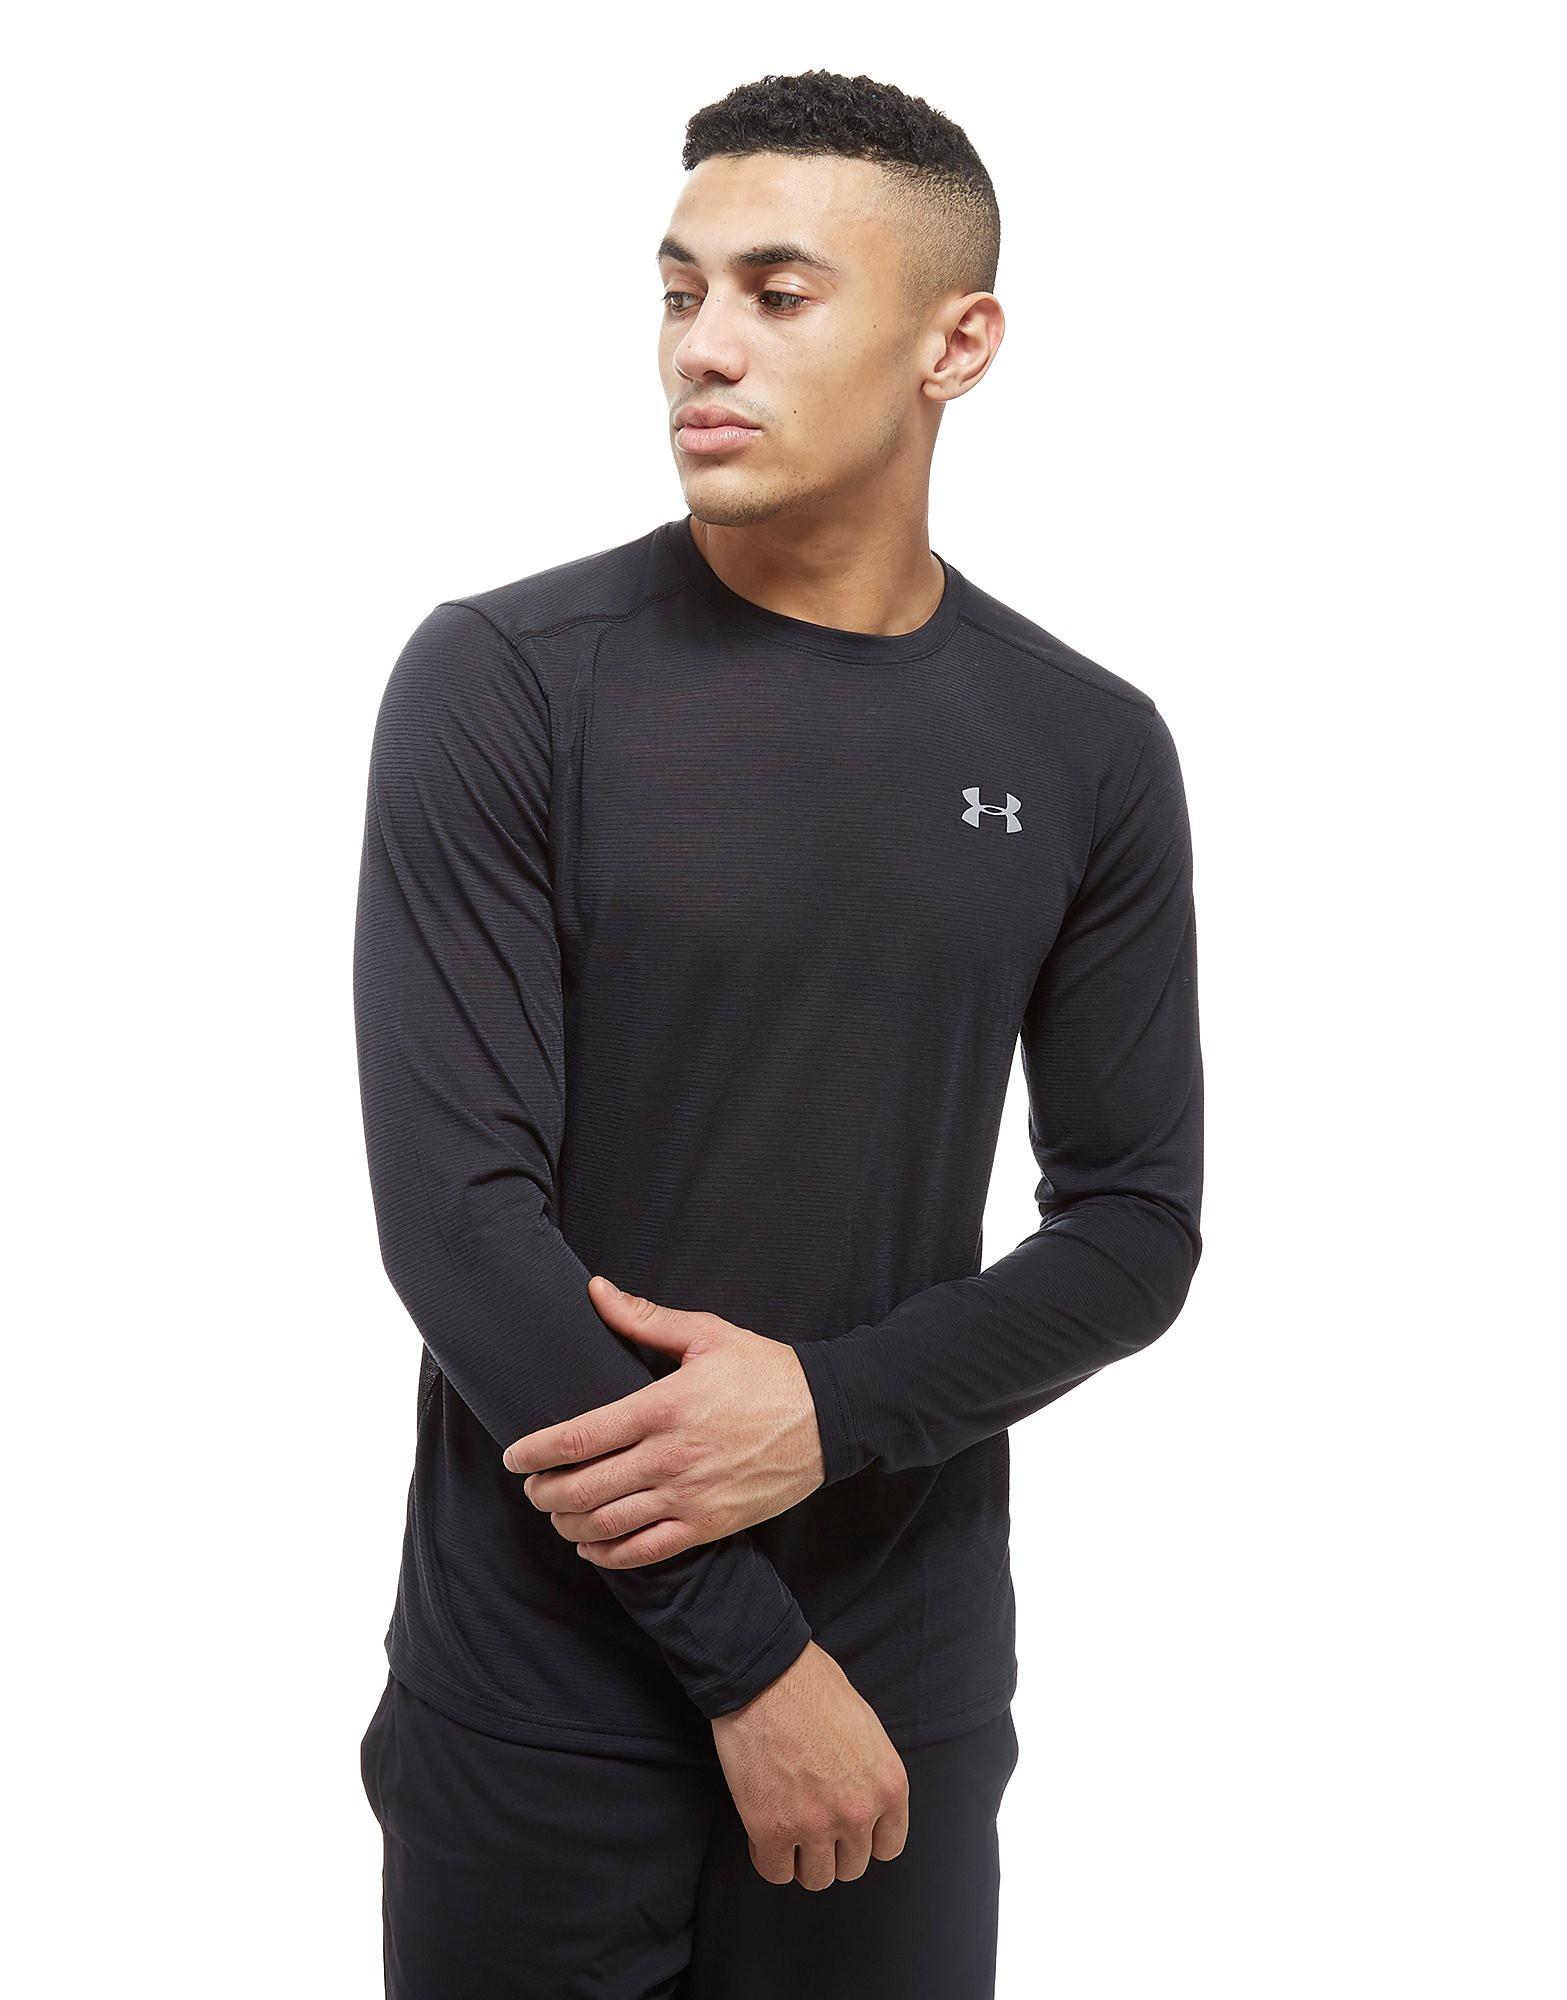 Under Armour Threadborne Streaker Long Sleeve T-Shirt